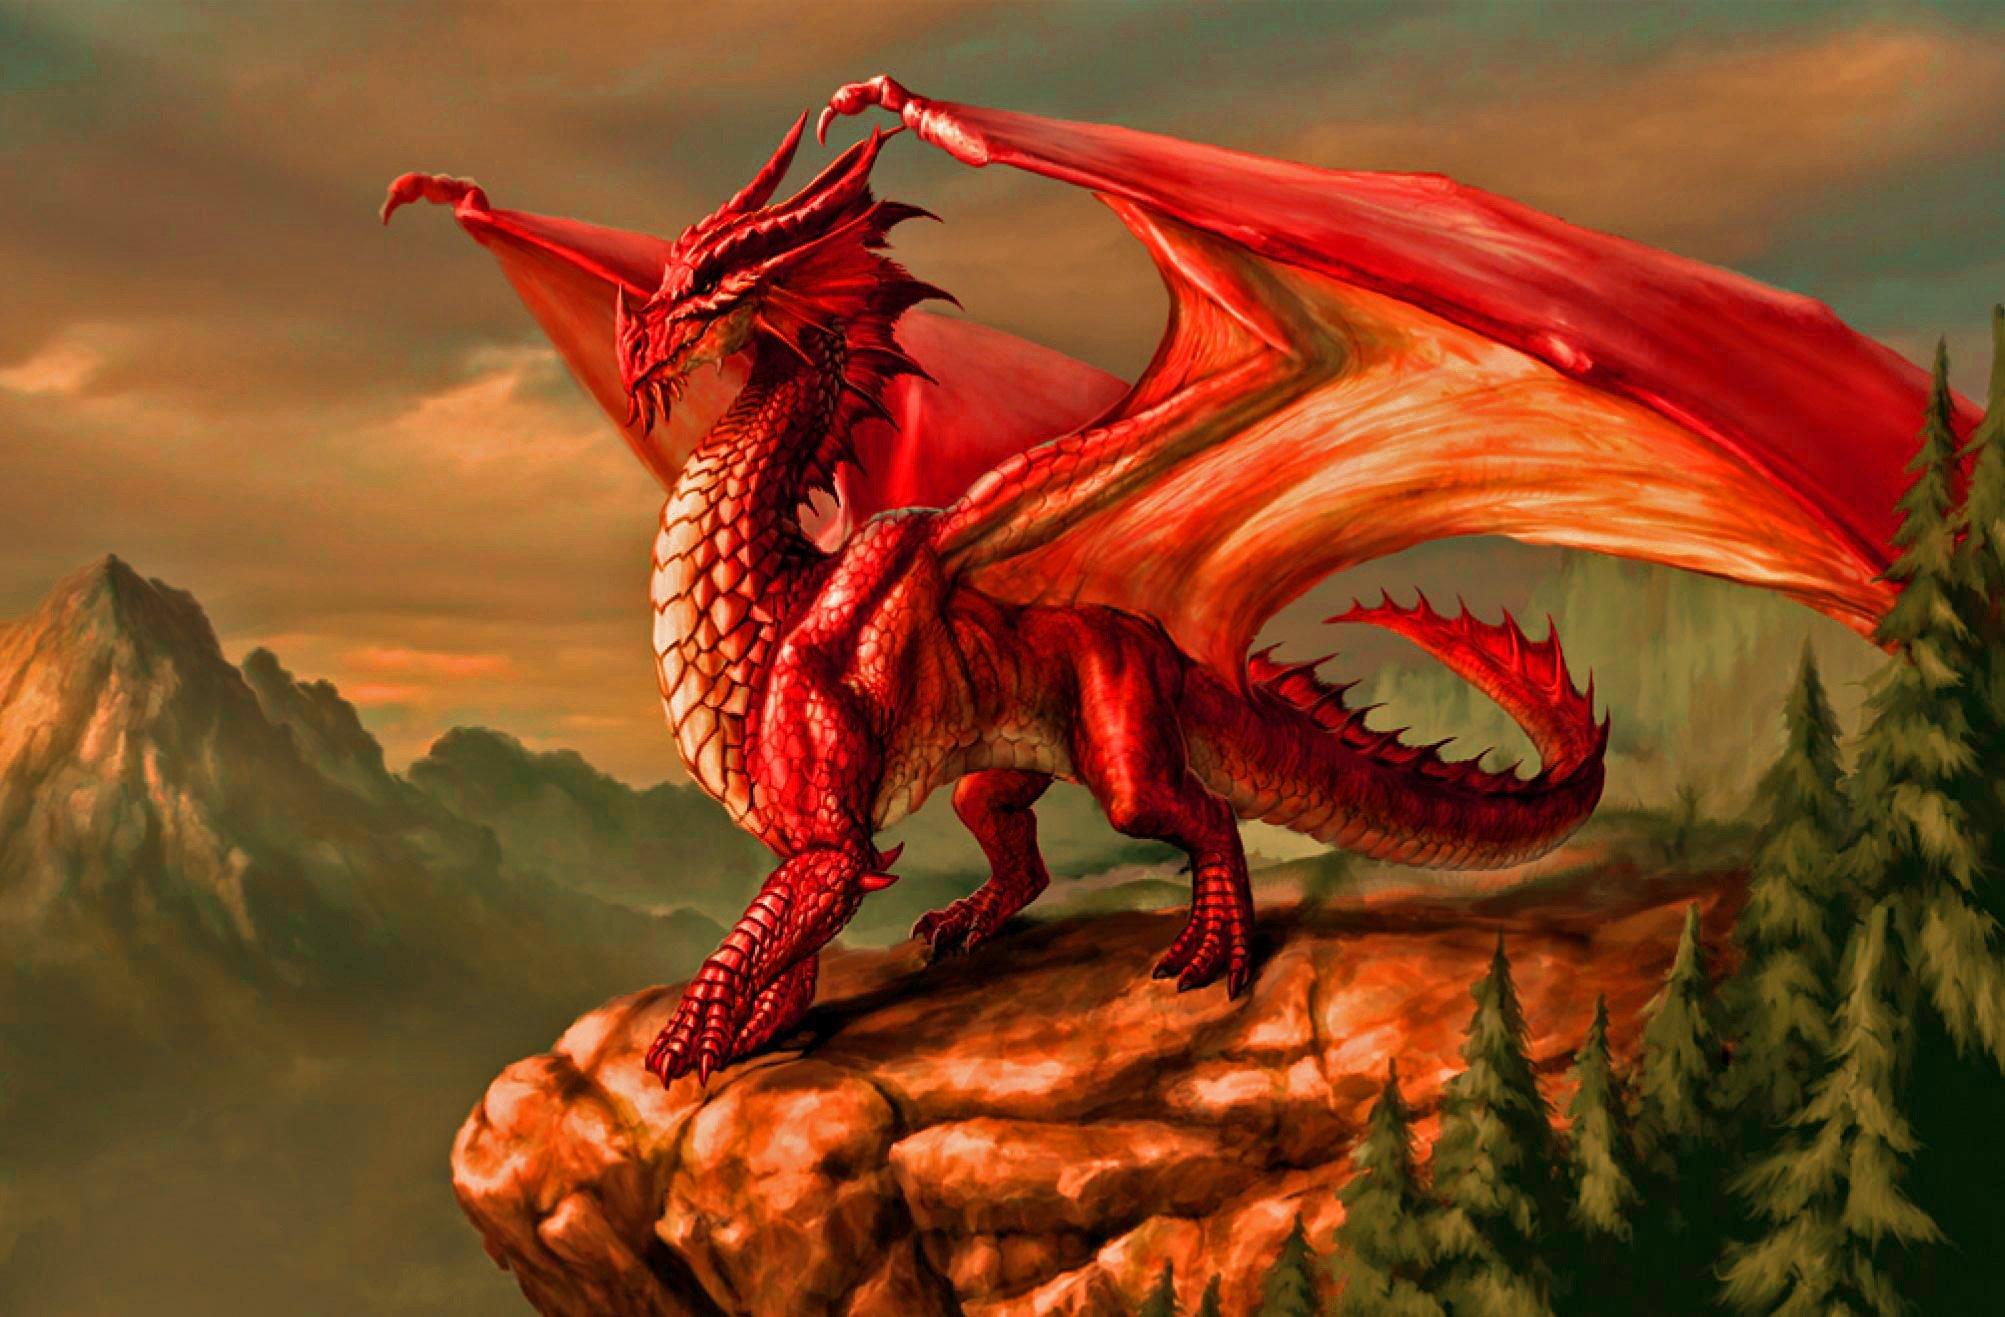 DRACONOMICON METALLIC DRAGONS Dungeons dragons metallic draconomicon 2005x1317